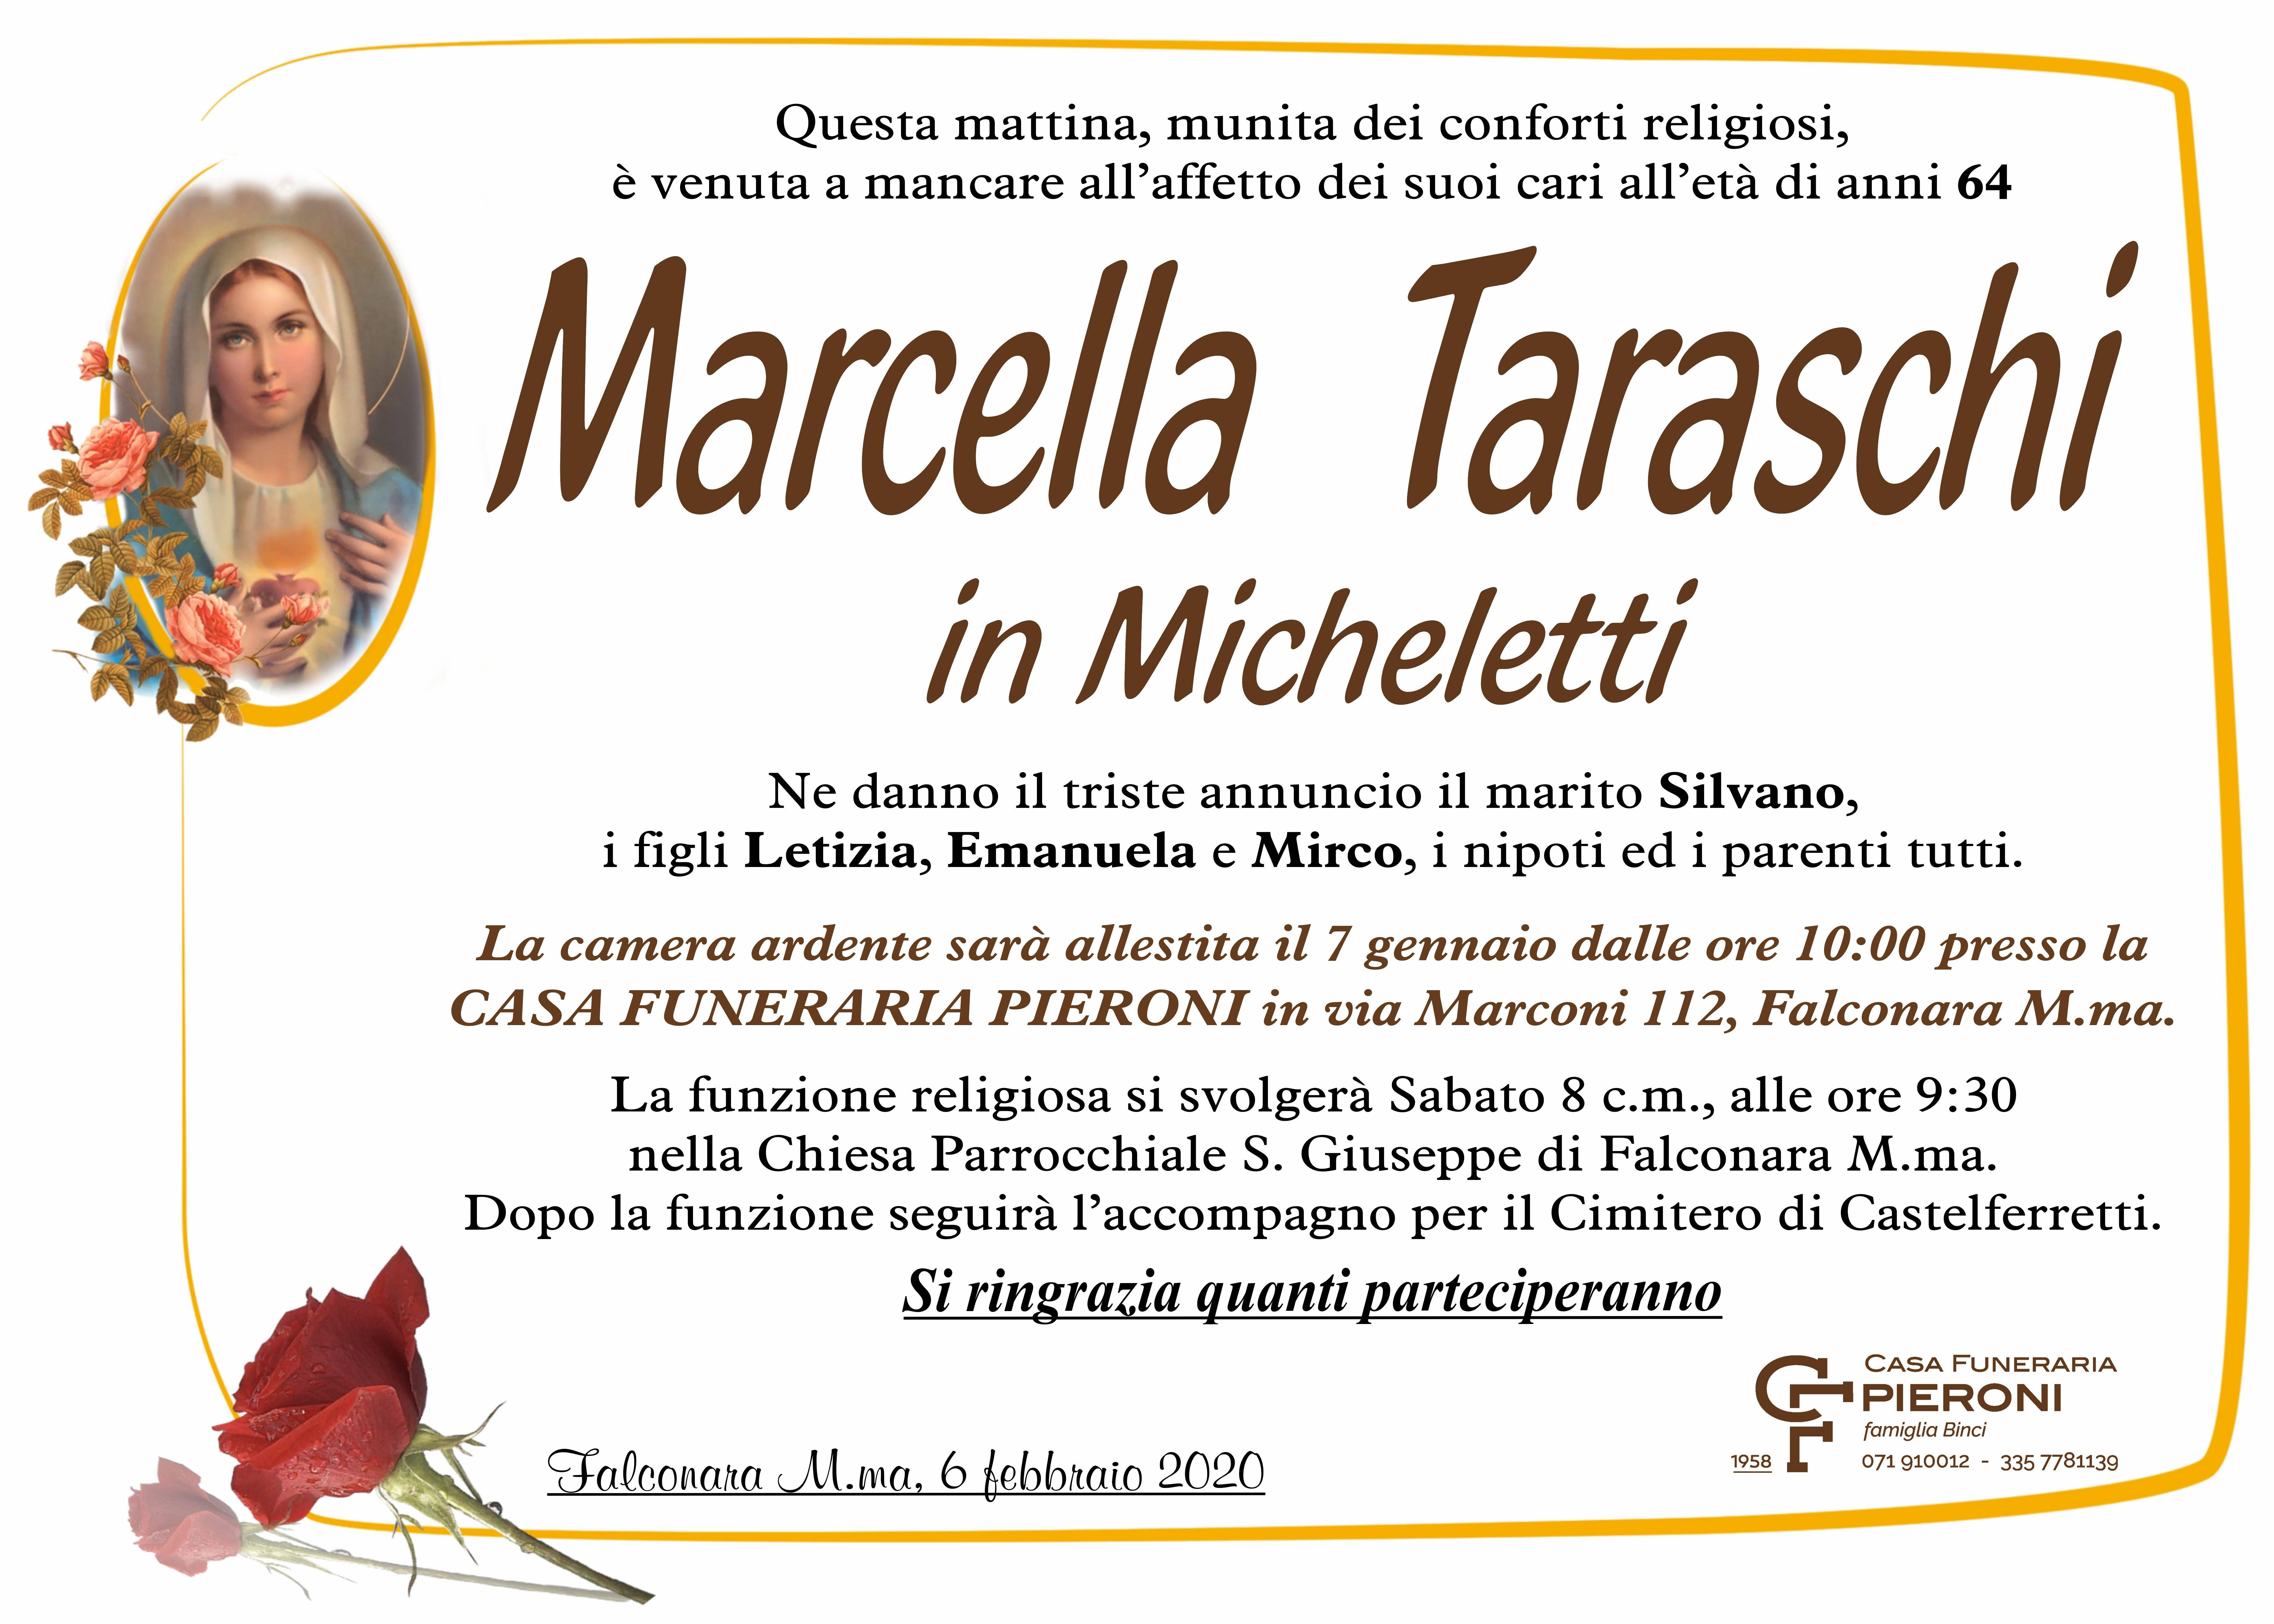 Marcella Taraschi